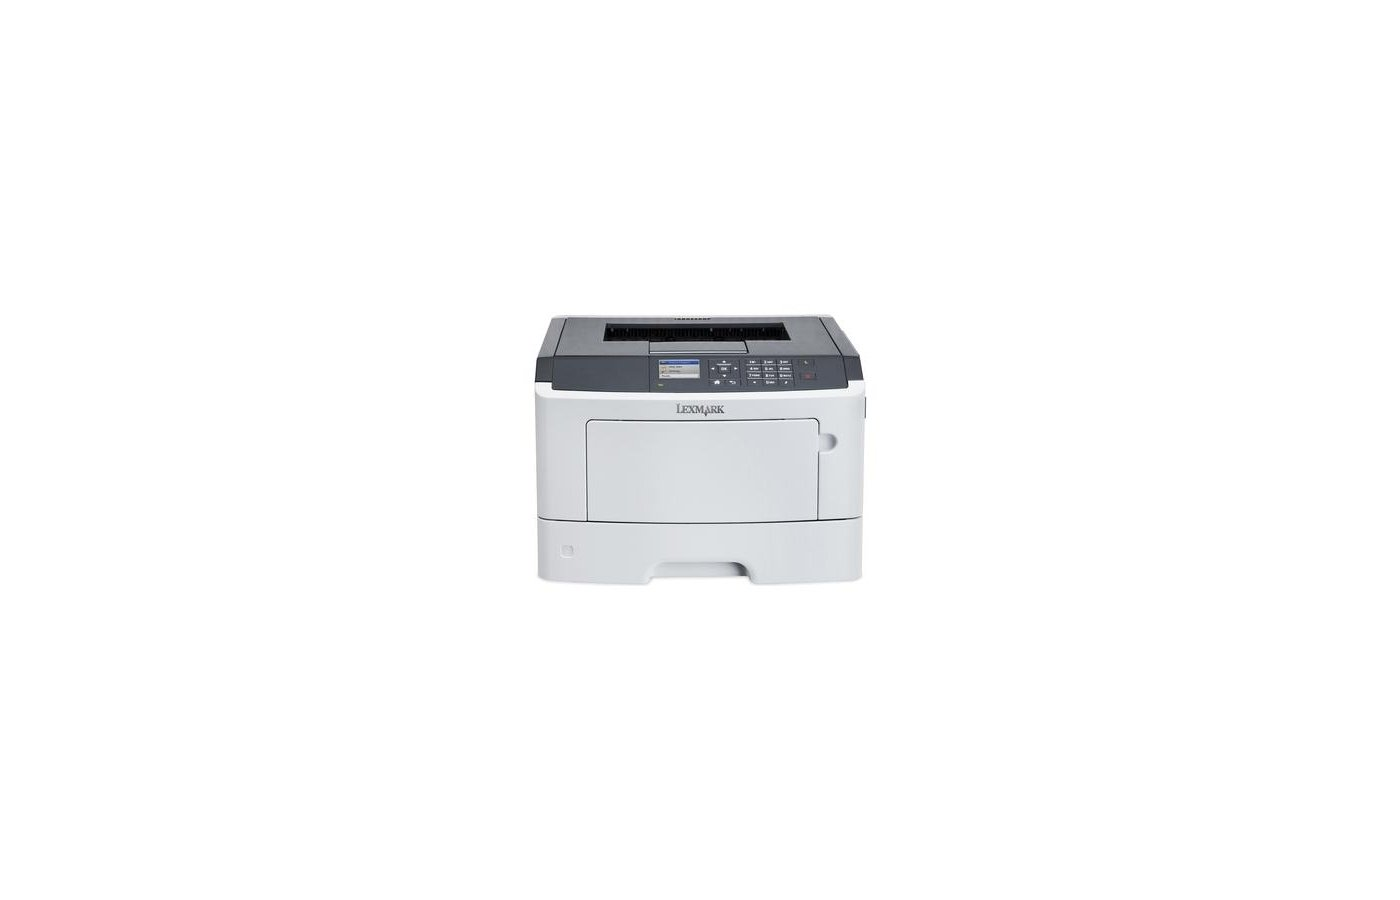 Принтер Lexmark MS510dn /35S0330/